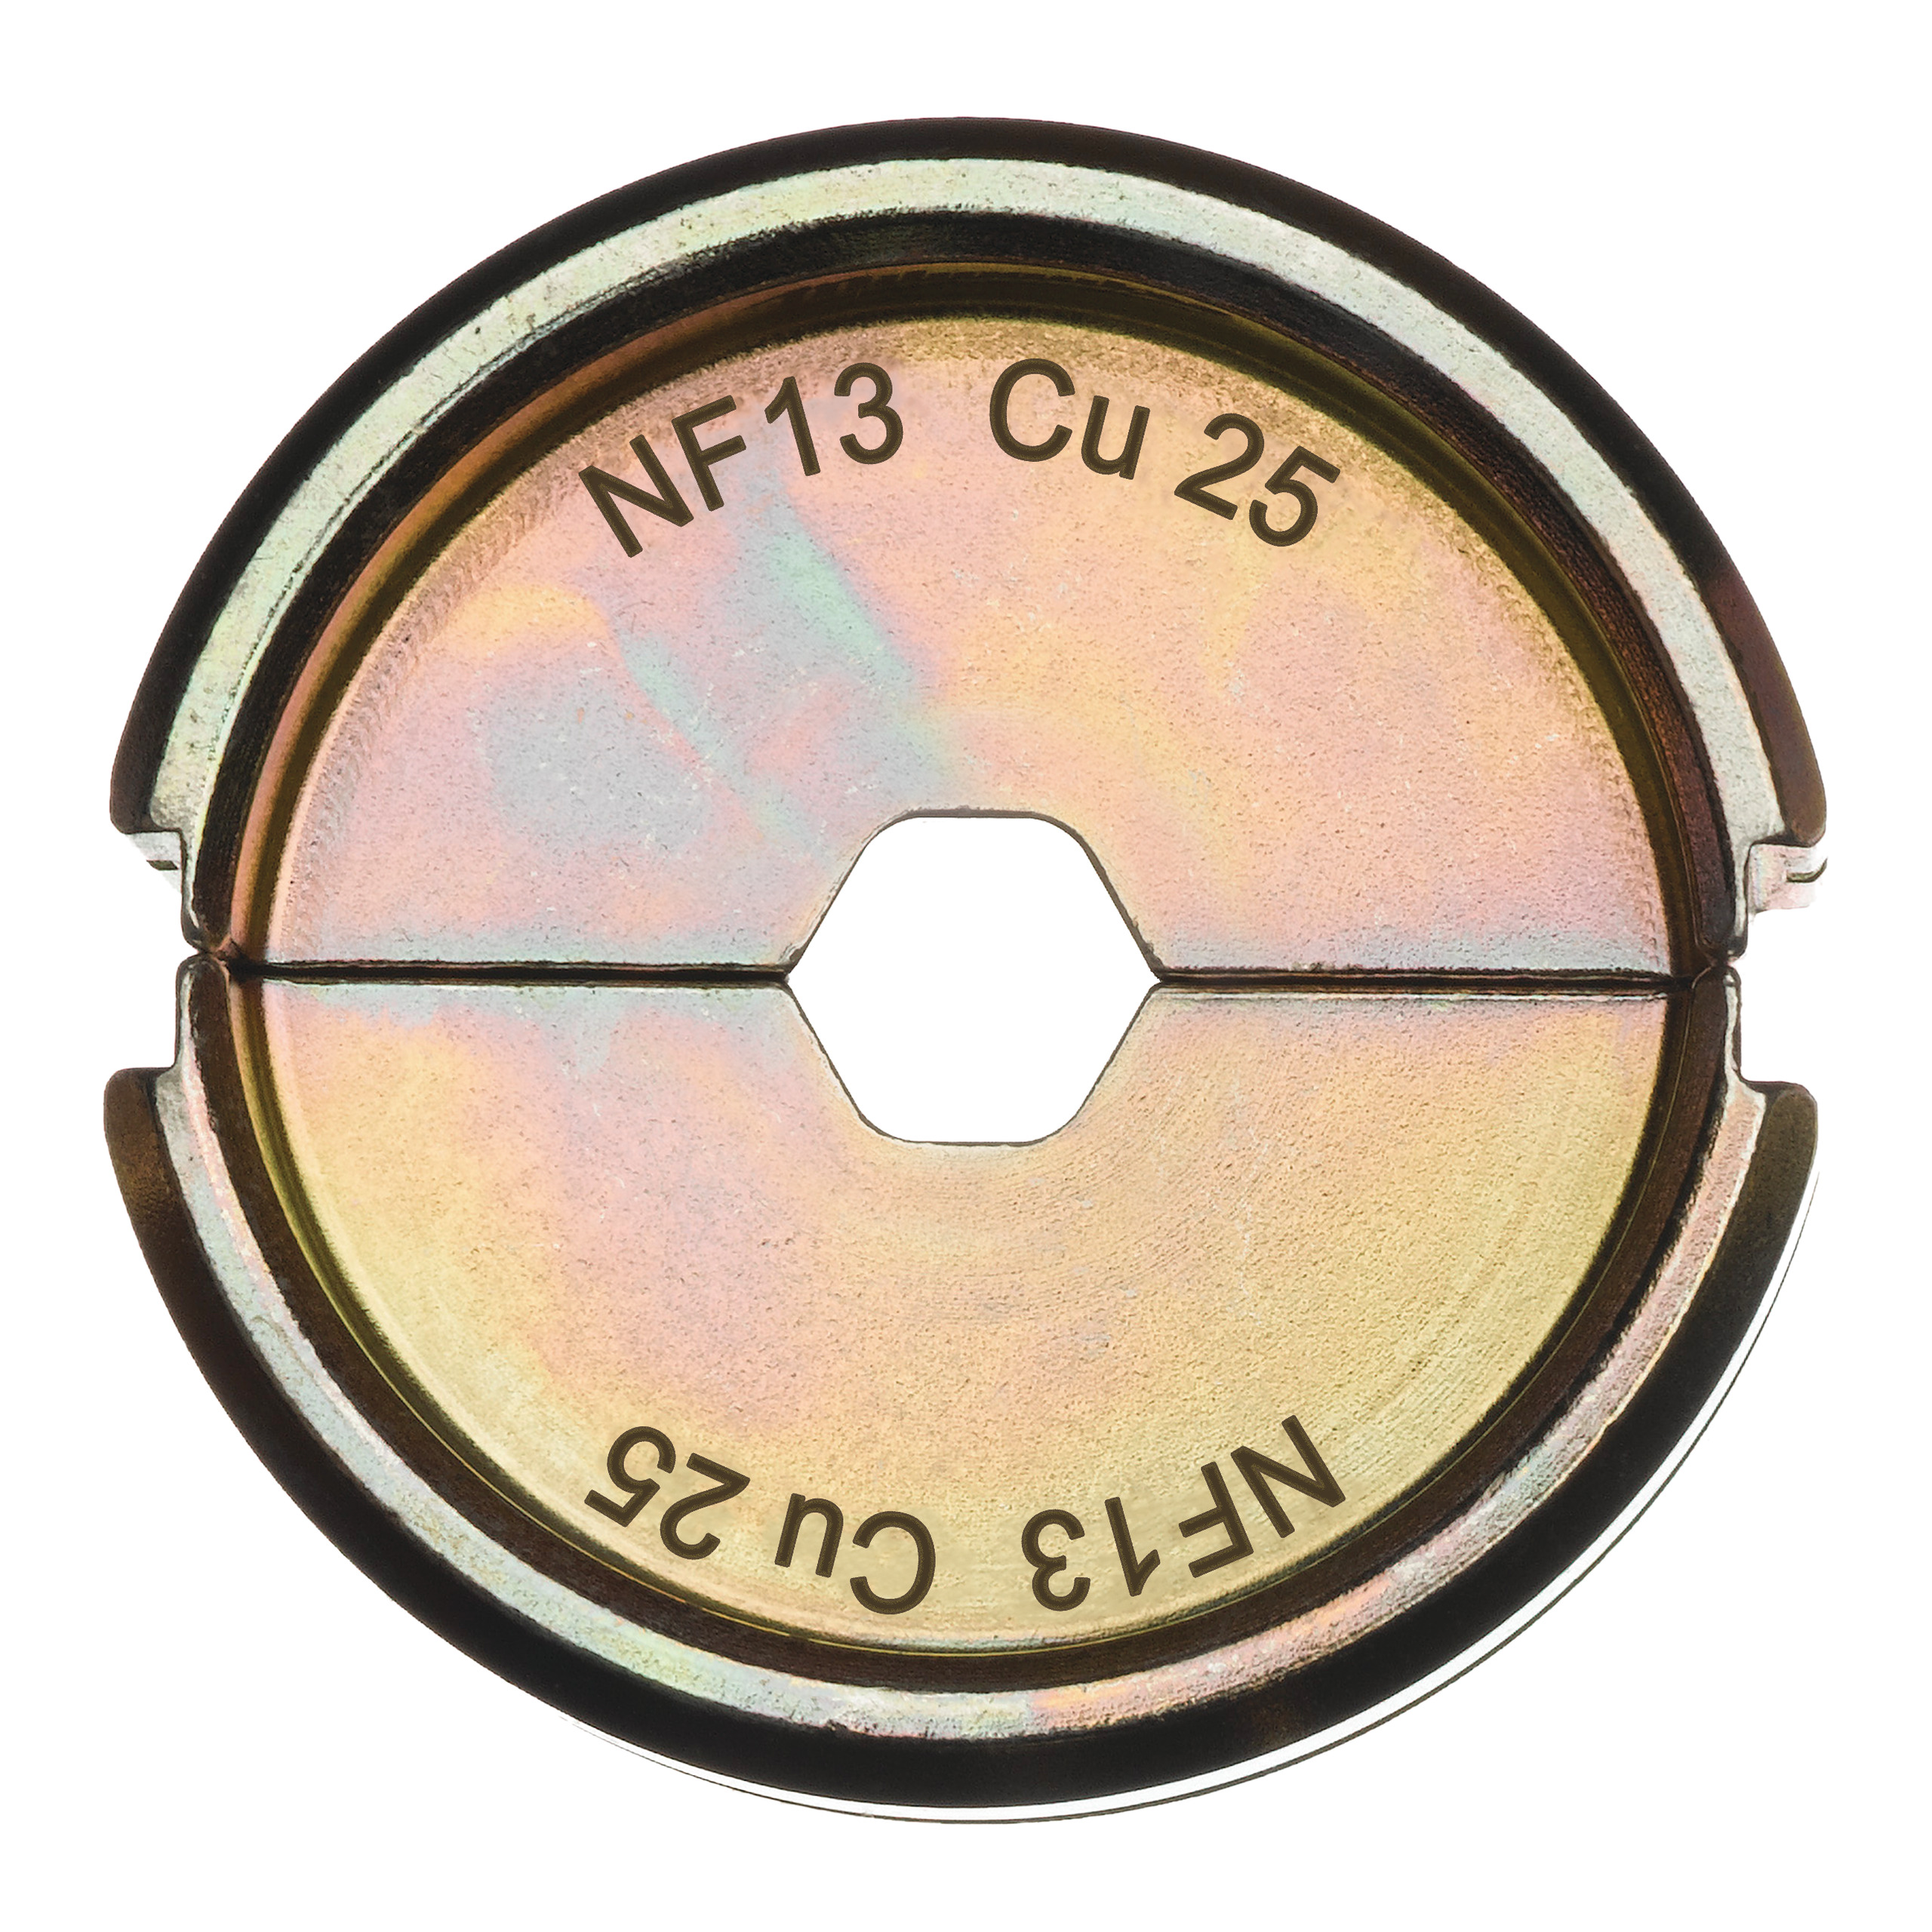 NF13 CU 25-1PC Pojistný kroužek